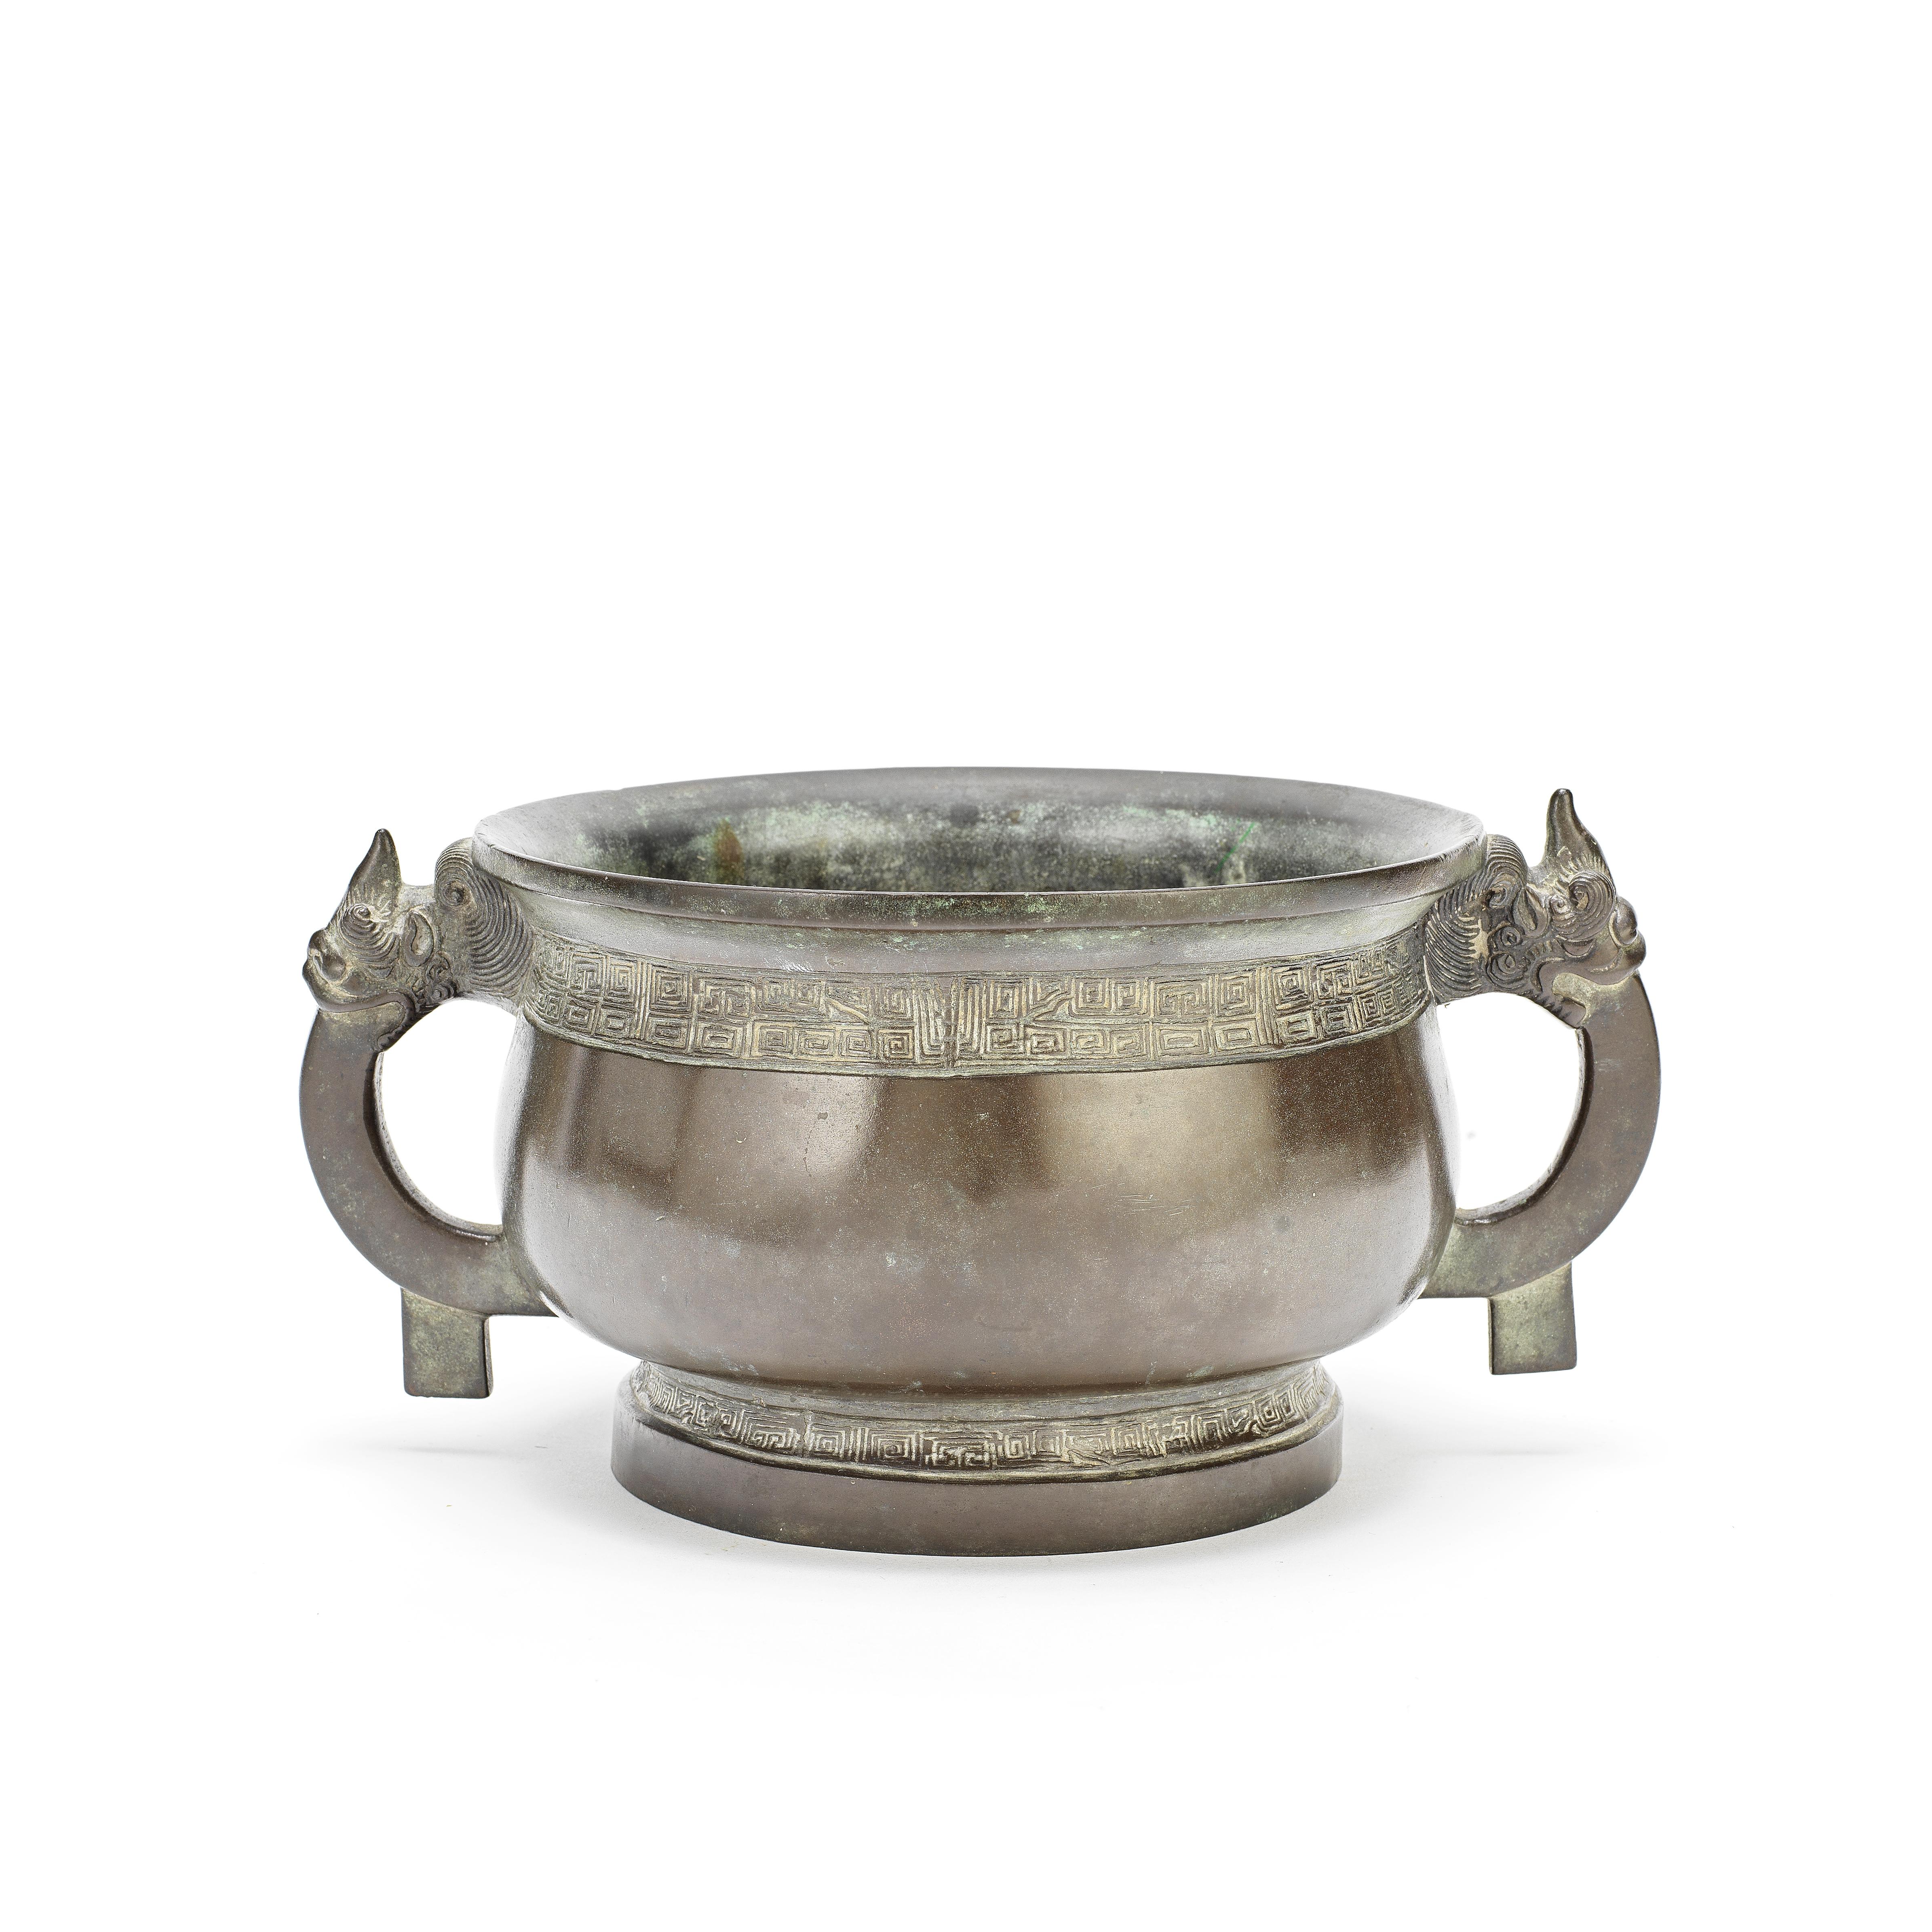 A BRONZE INCENSE BURNER, GUI Ming Dynasty